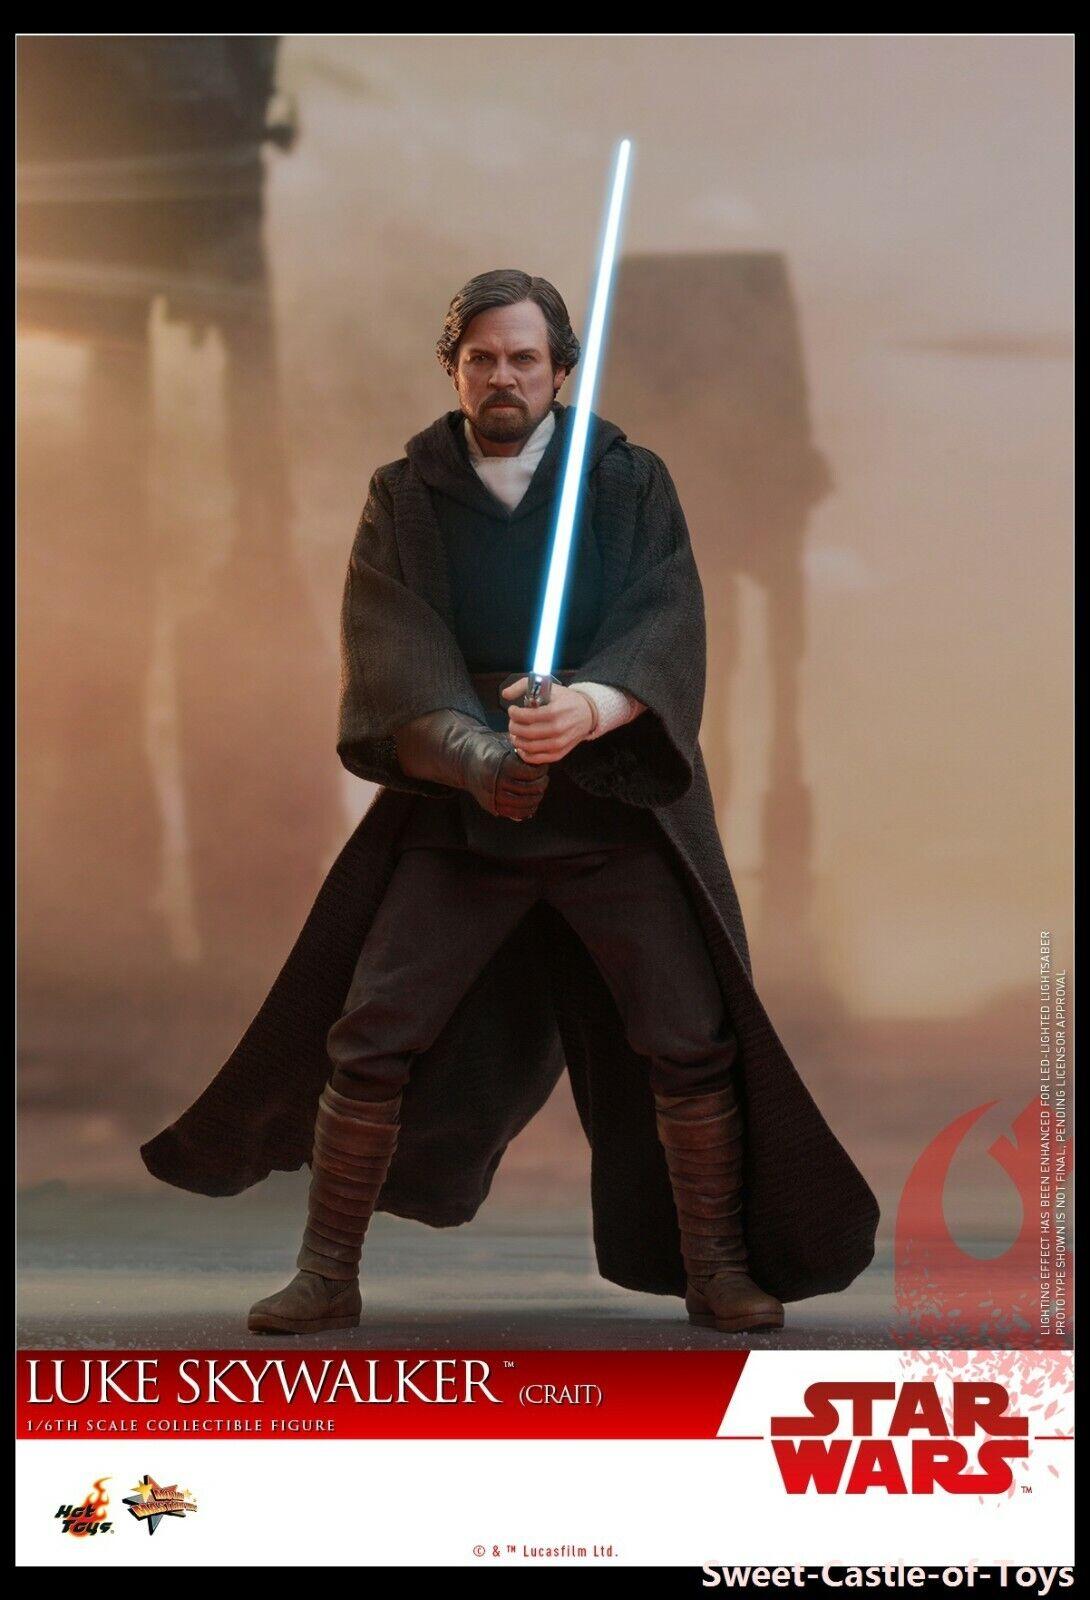 1 6 Hot Toys Star Wars The Last Jedi Luke Skywalker Crait Ver Collectible Figure